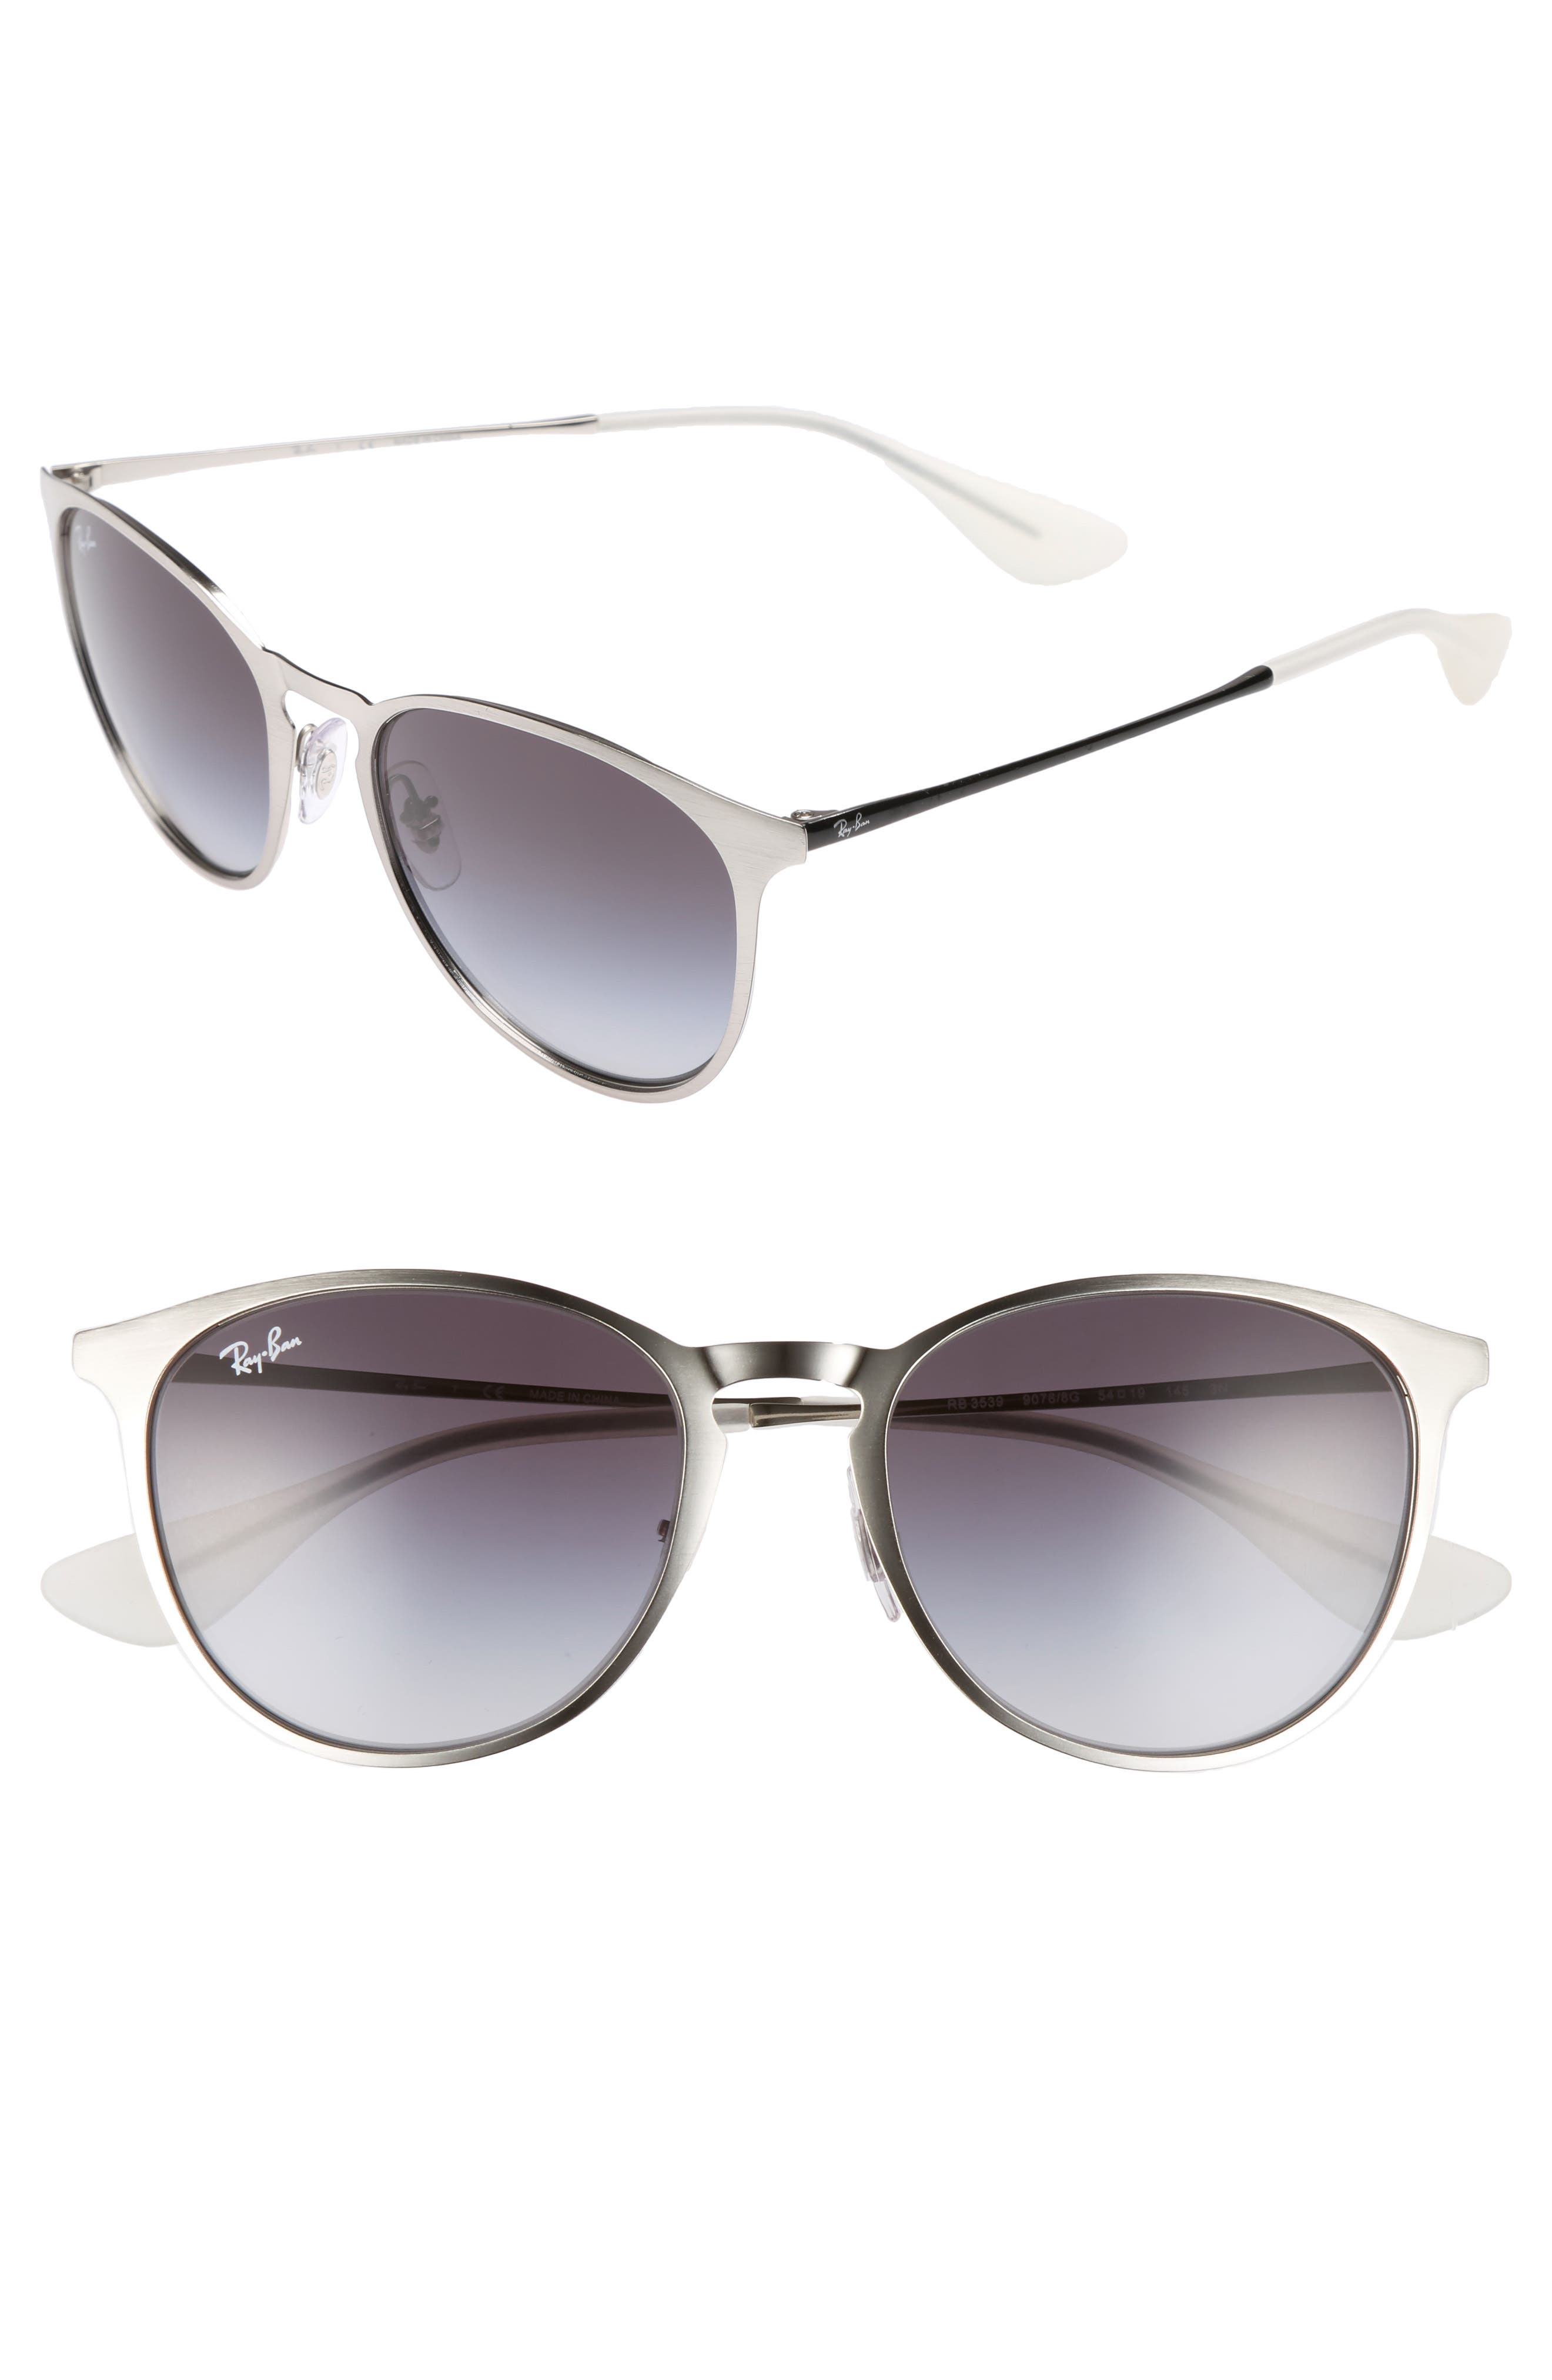 Erika 54mm Metal Sunglasses,                             Main thumbnail 1, color,                             LITE SILVER